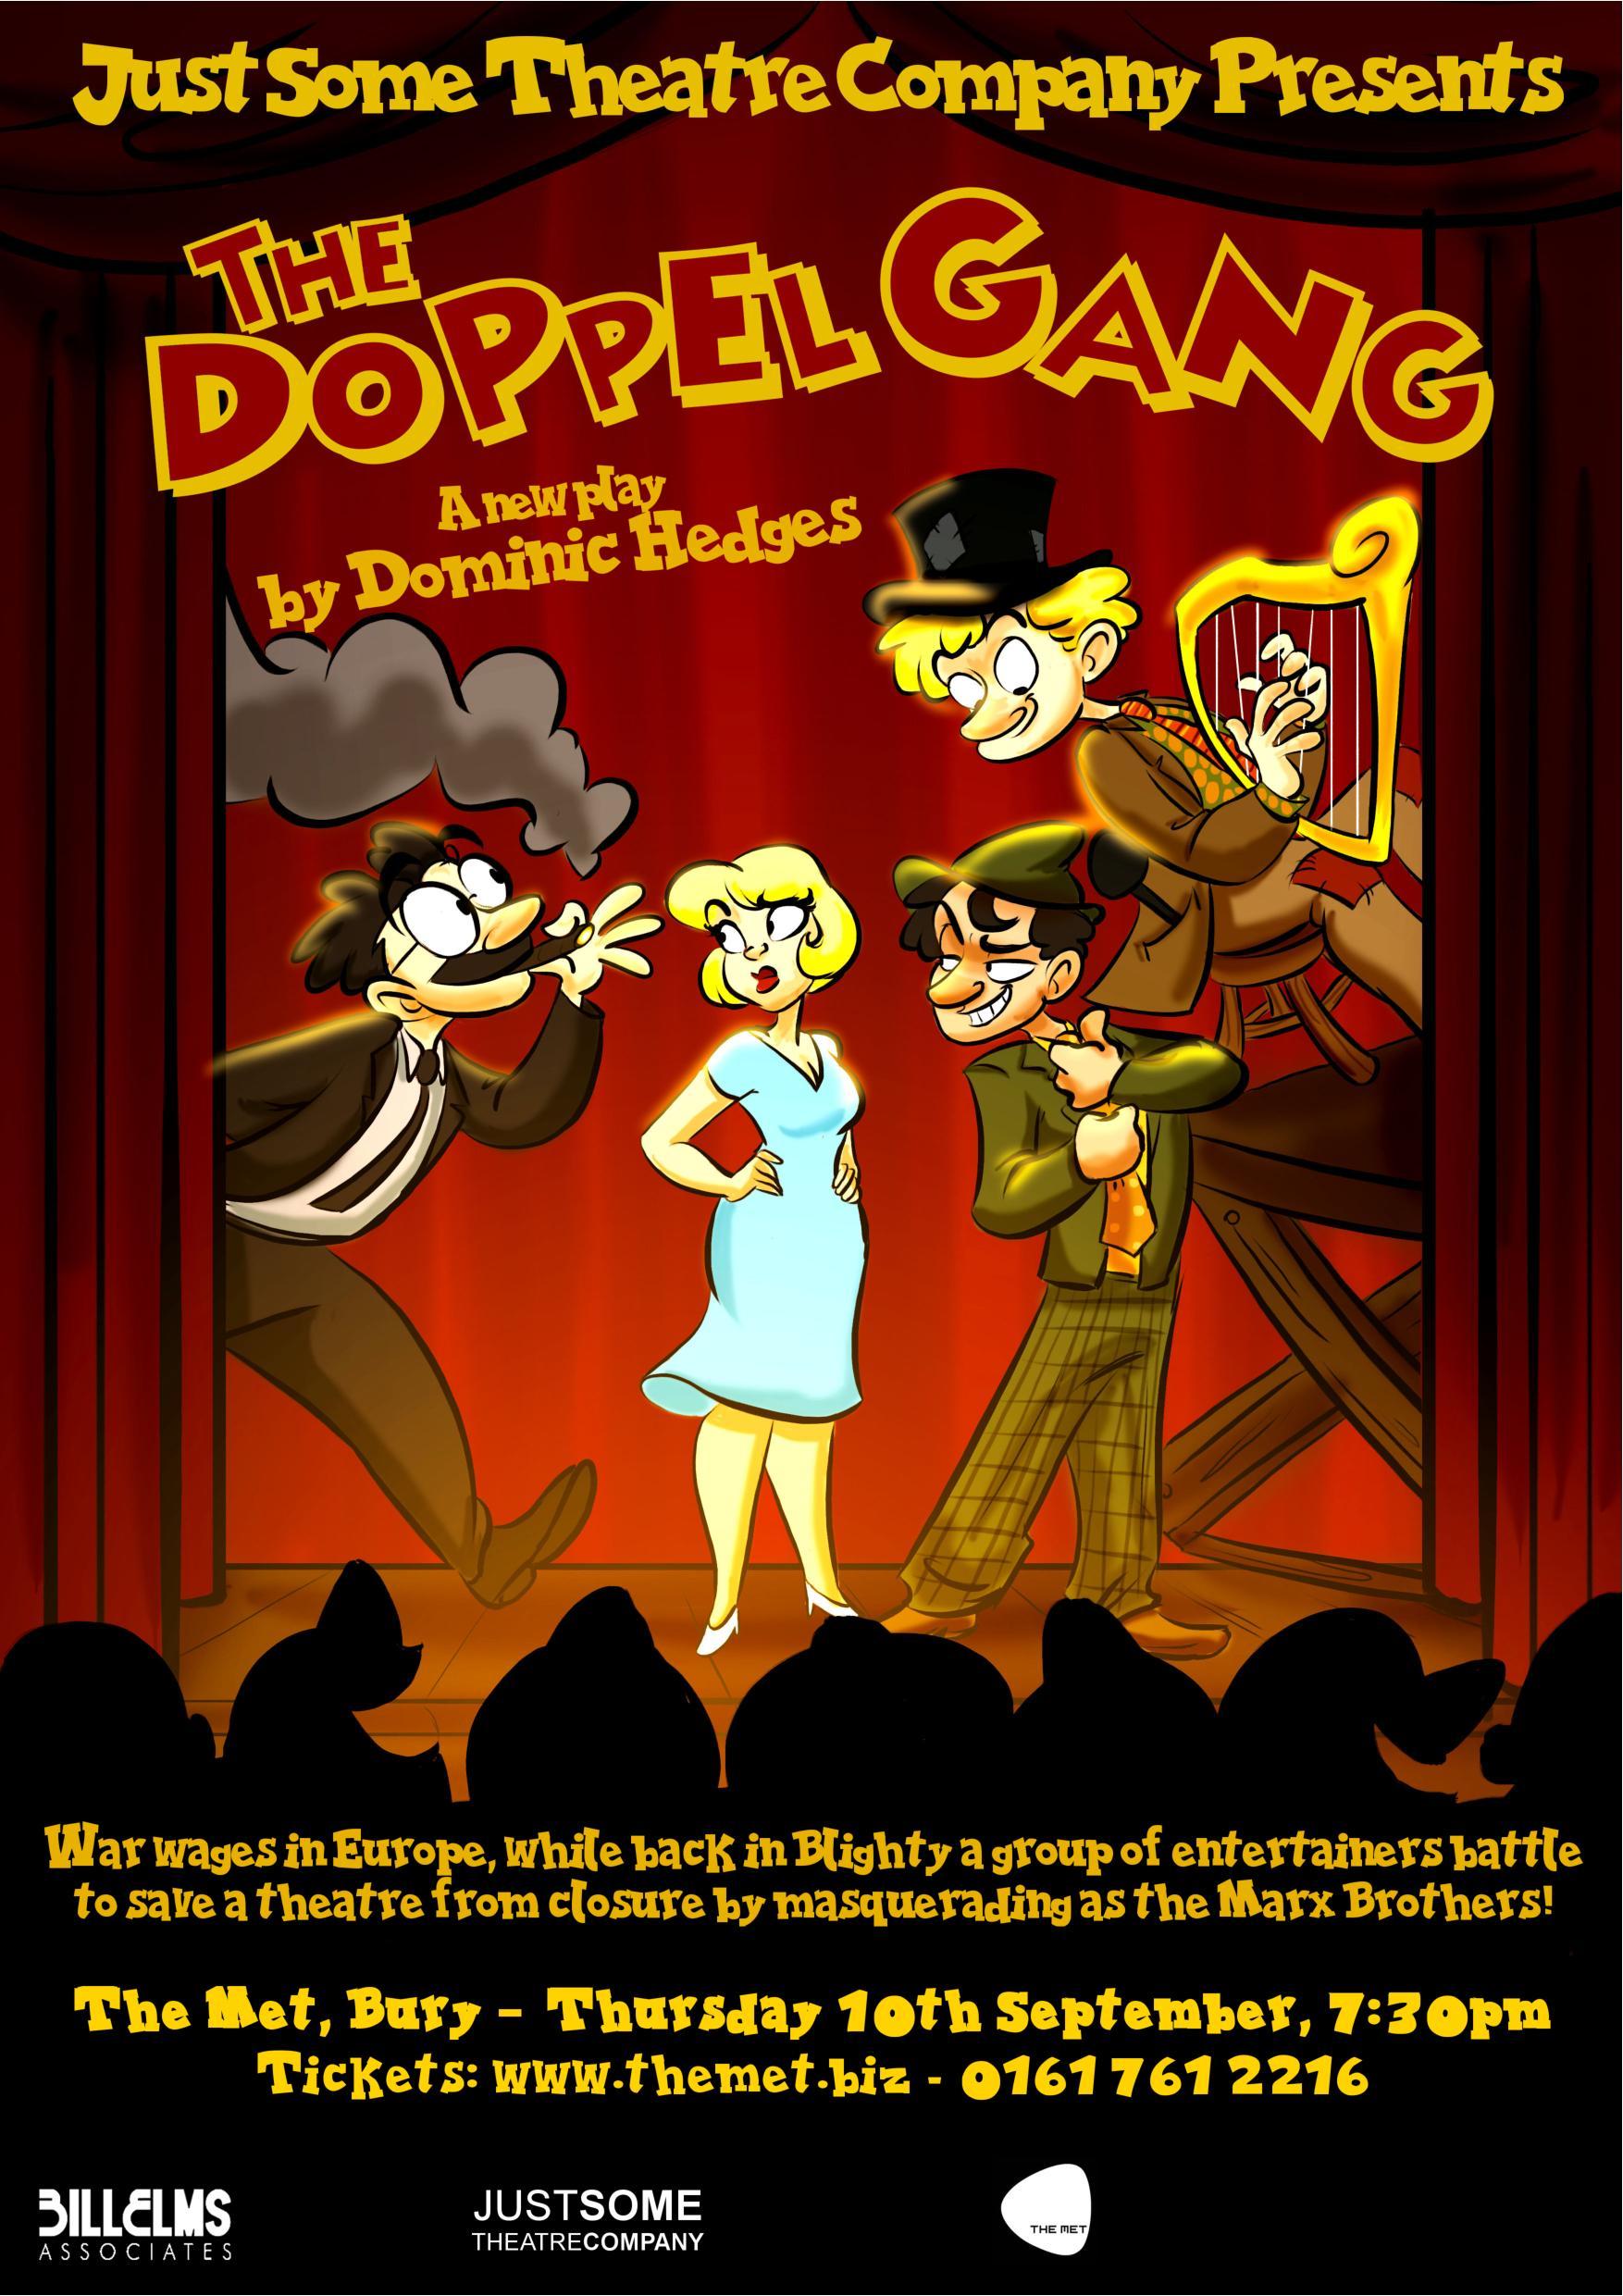 THE DOPPEL GANG - UK TOUR